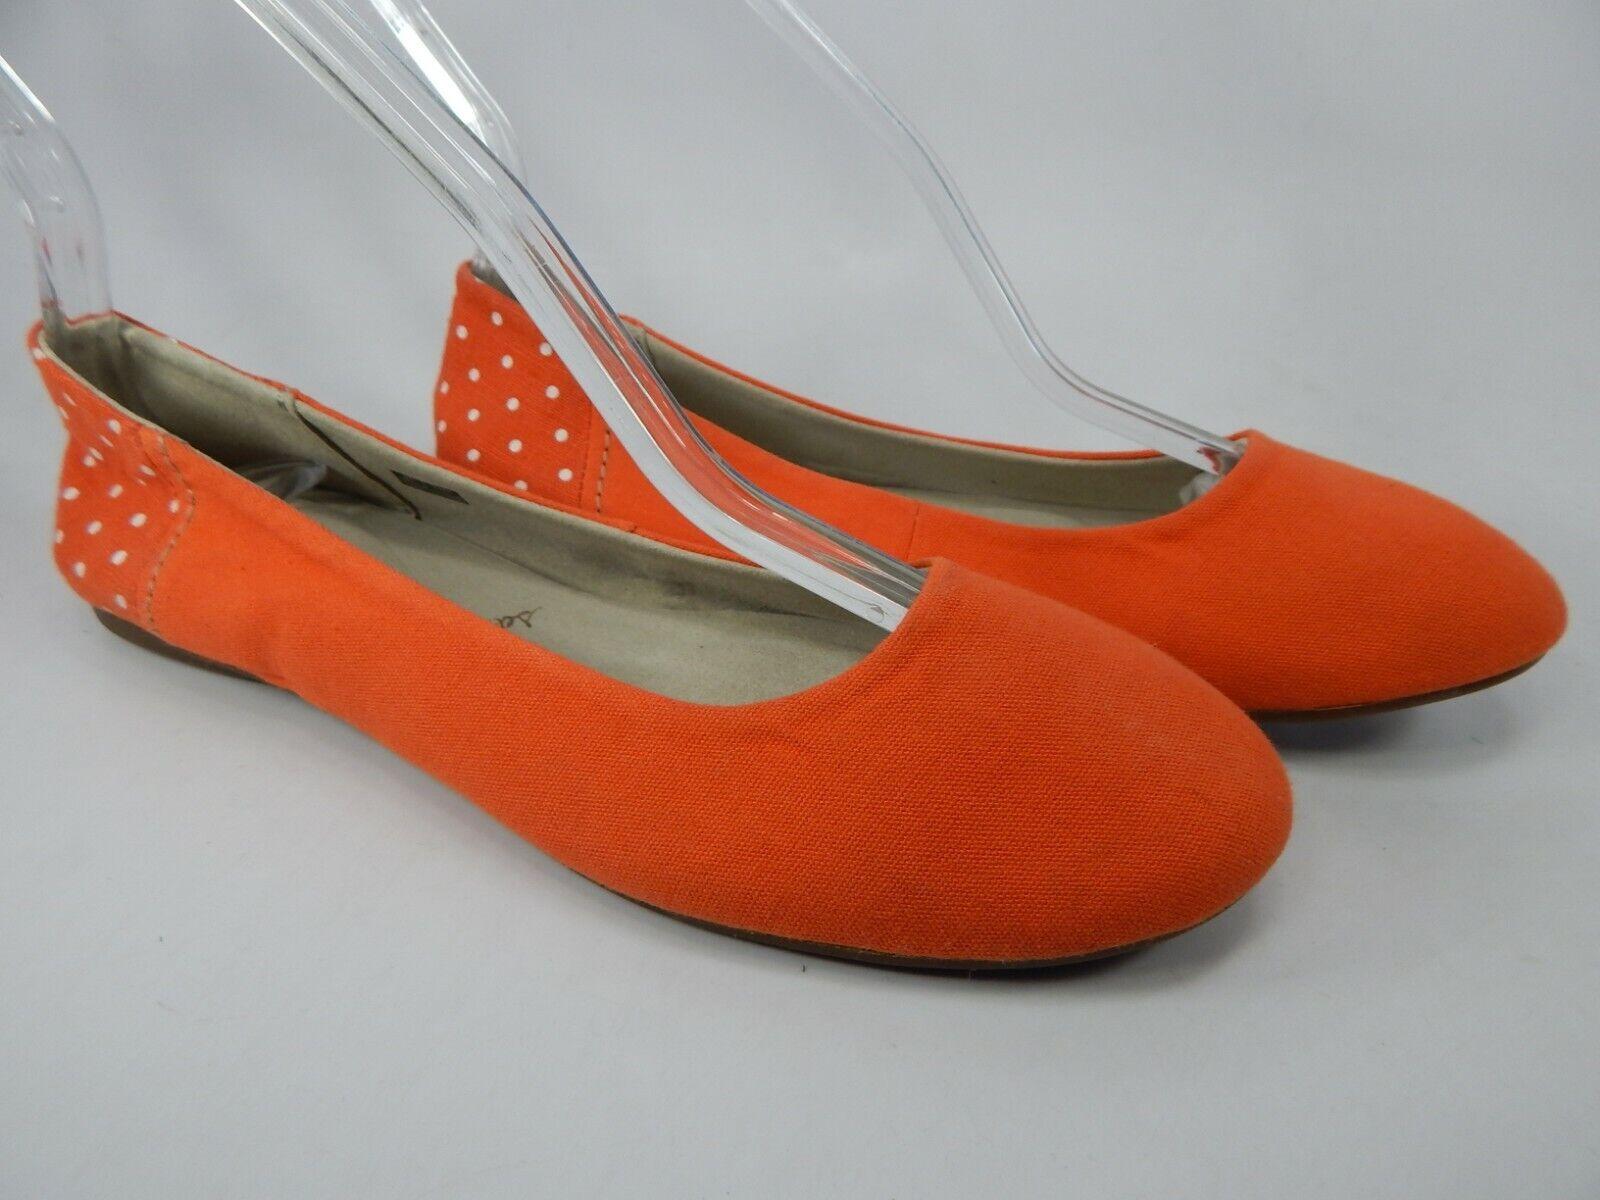 Sanuk Yoga Eve Size 7 M (B) EU 38 Women's Ballet Flats shoes orange SWF10603R